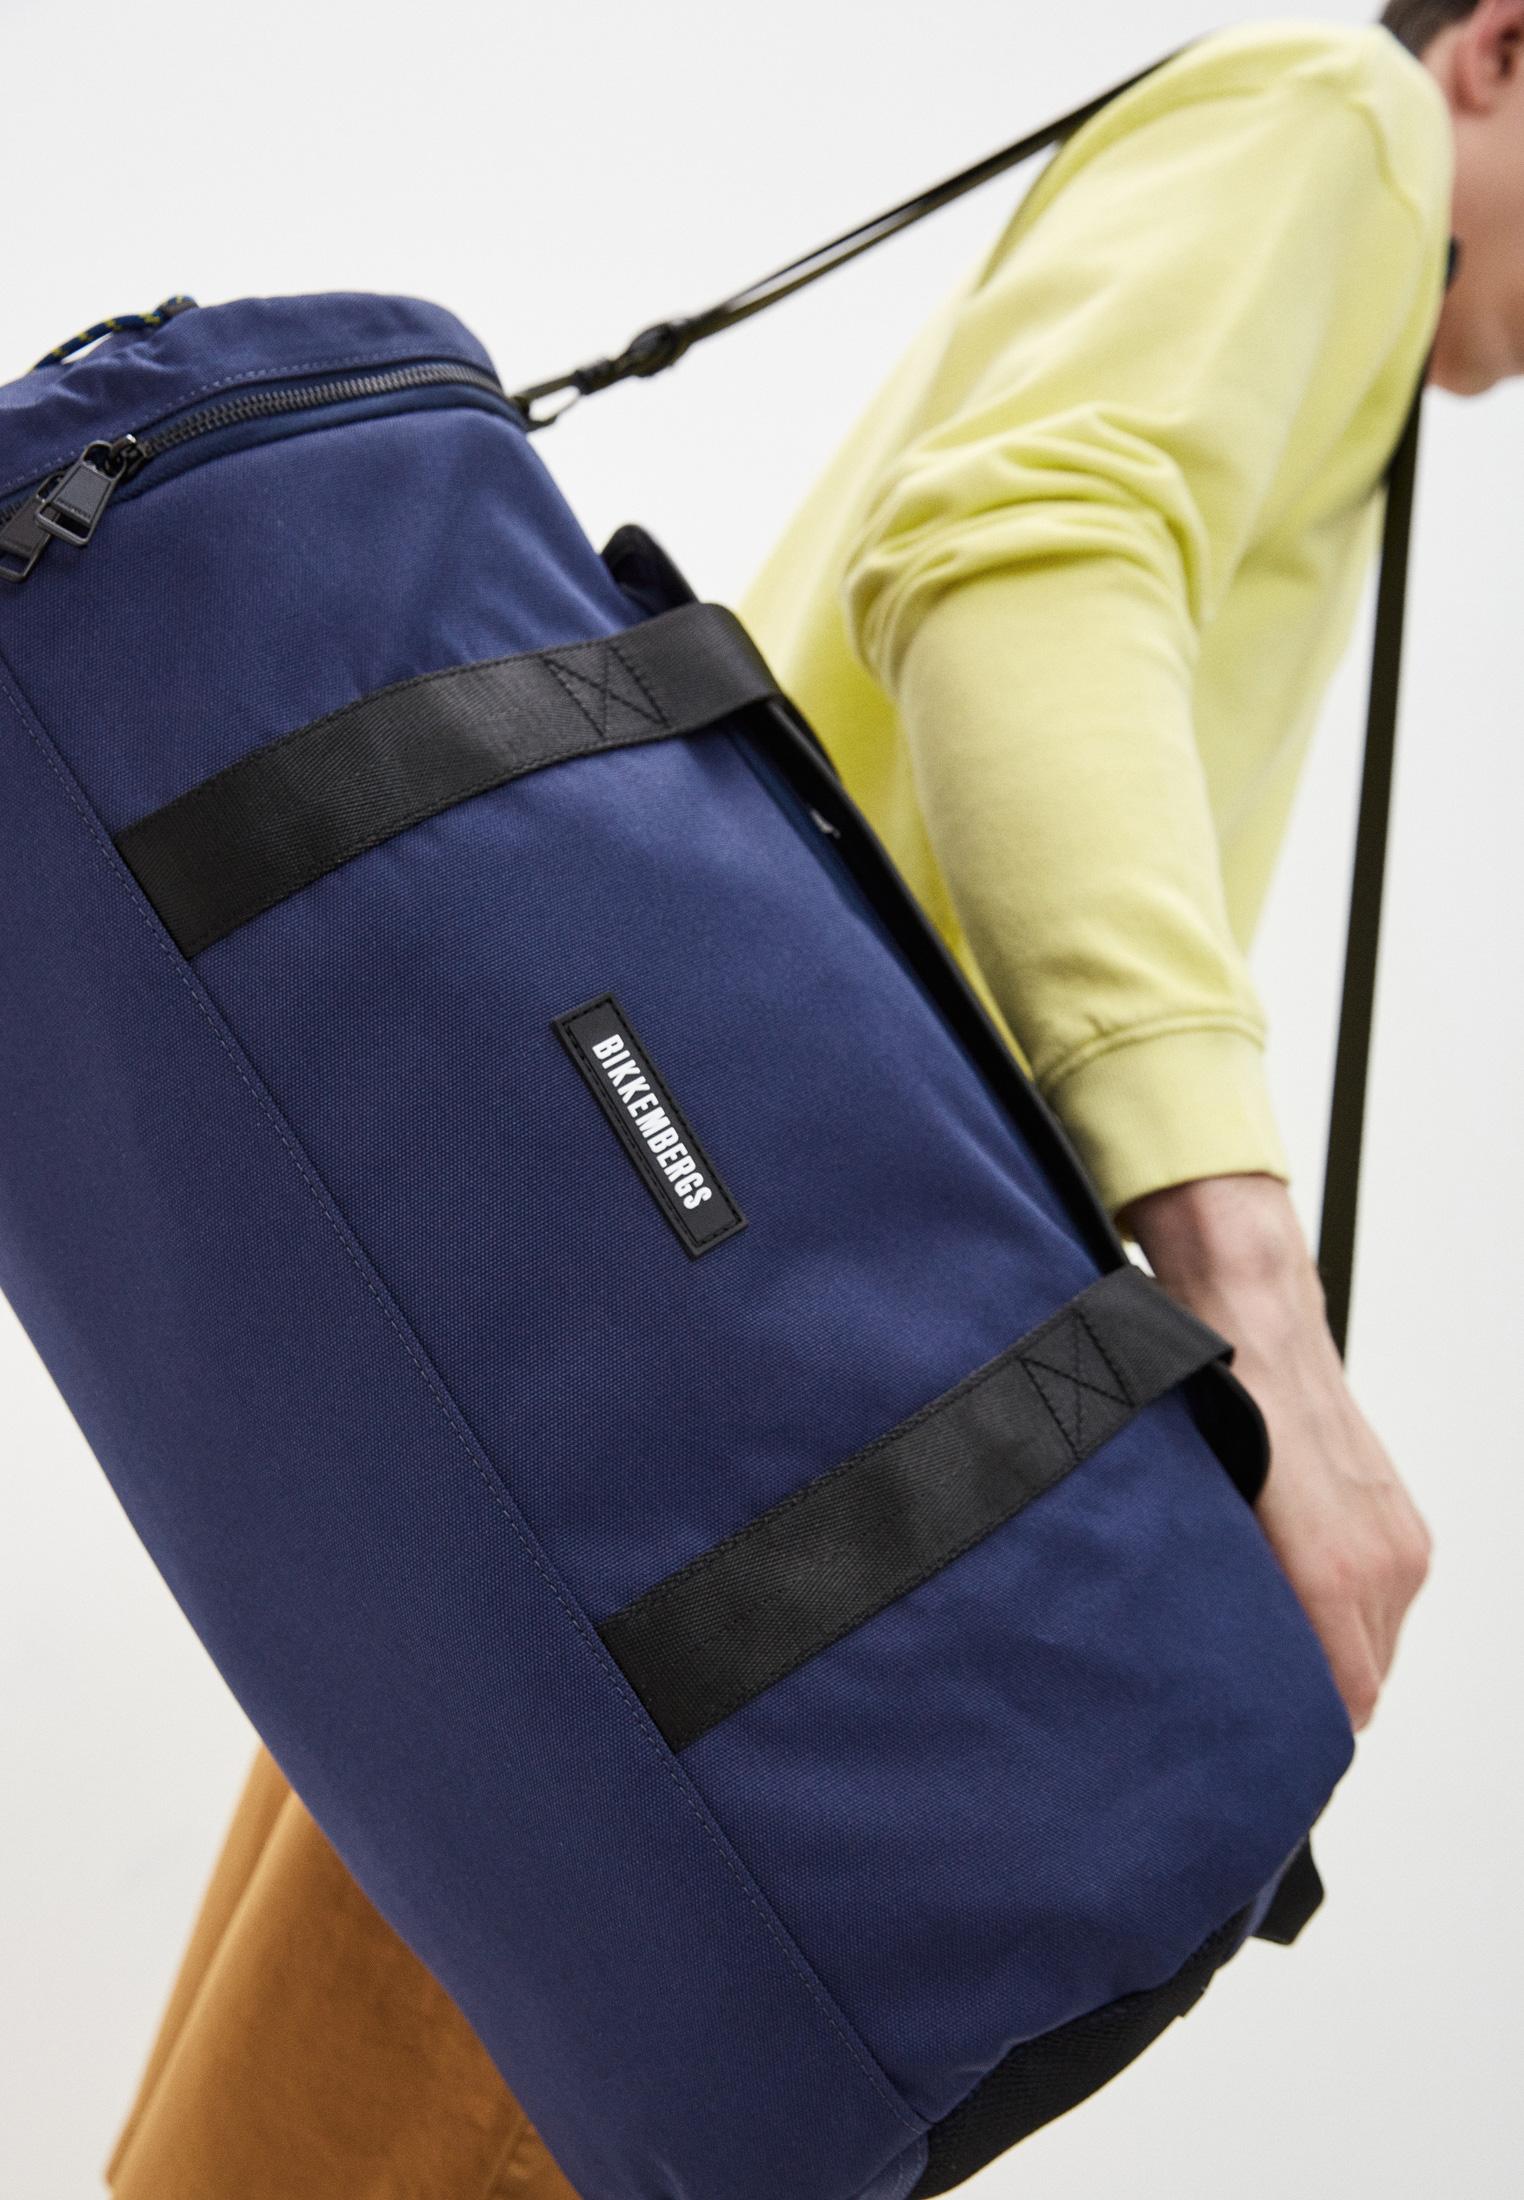 Спортивная сумка Bikkembergs (Биккембергс) E2BPME1L005Z082